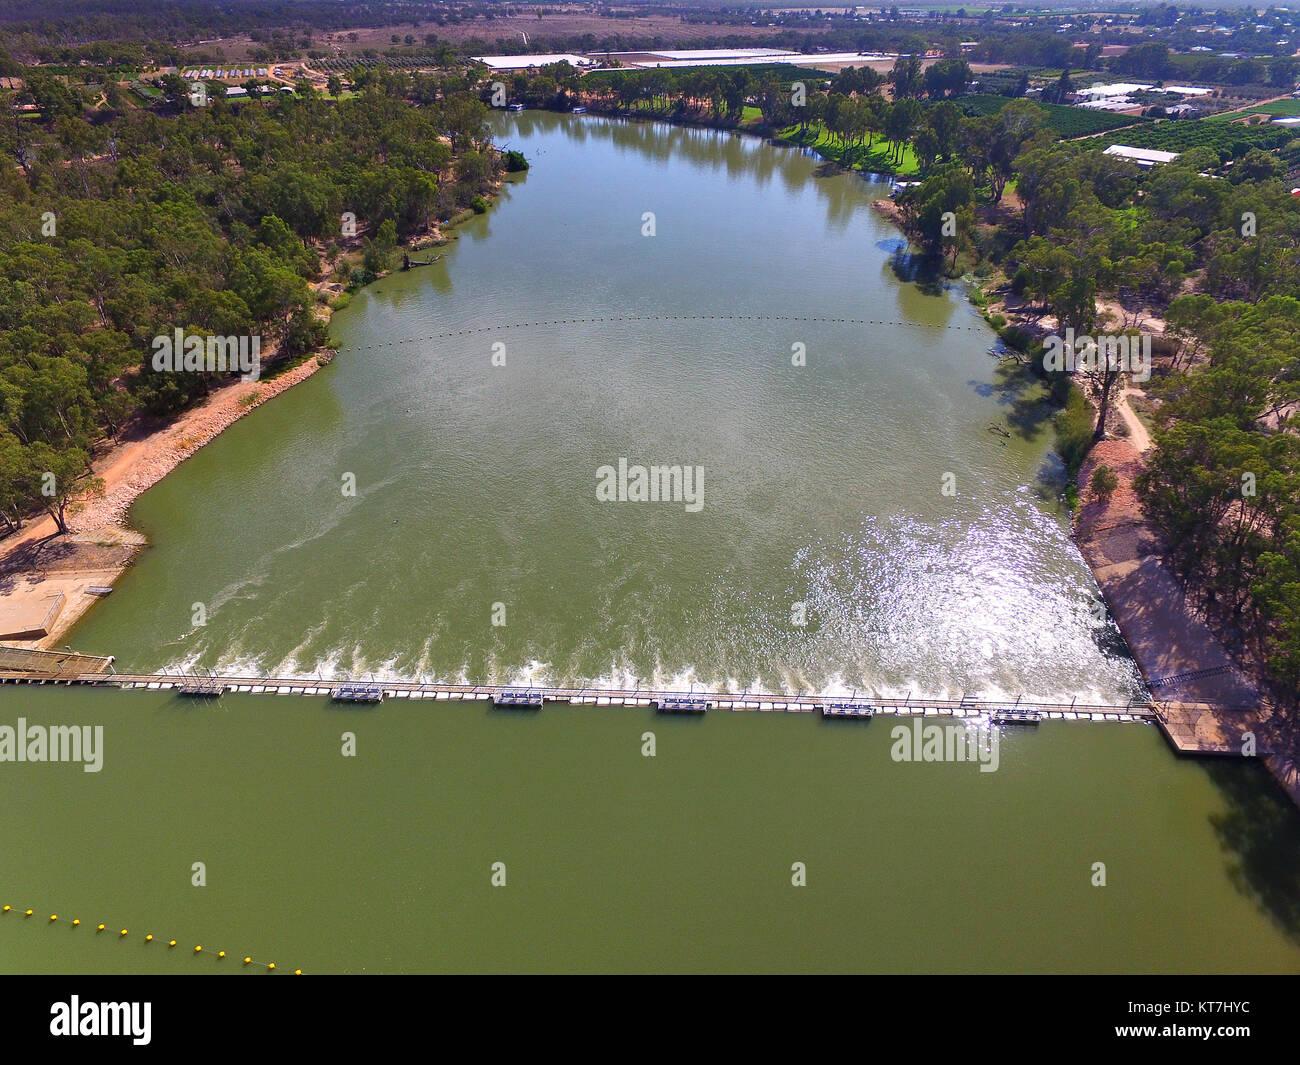 Aerial view of Mildura Weir. Location: River Murray, Mildura, Victoria. Murray River Locks. - Stock Image